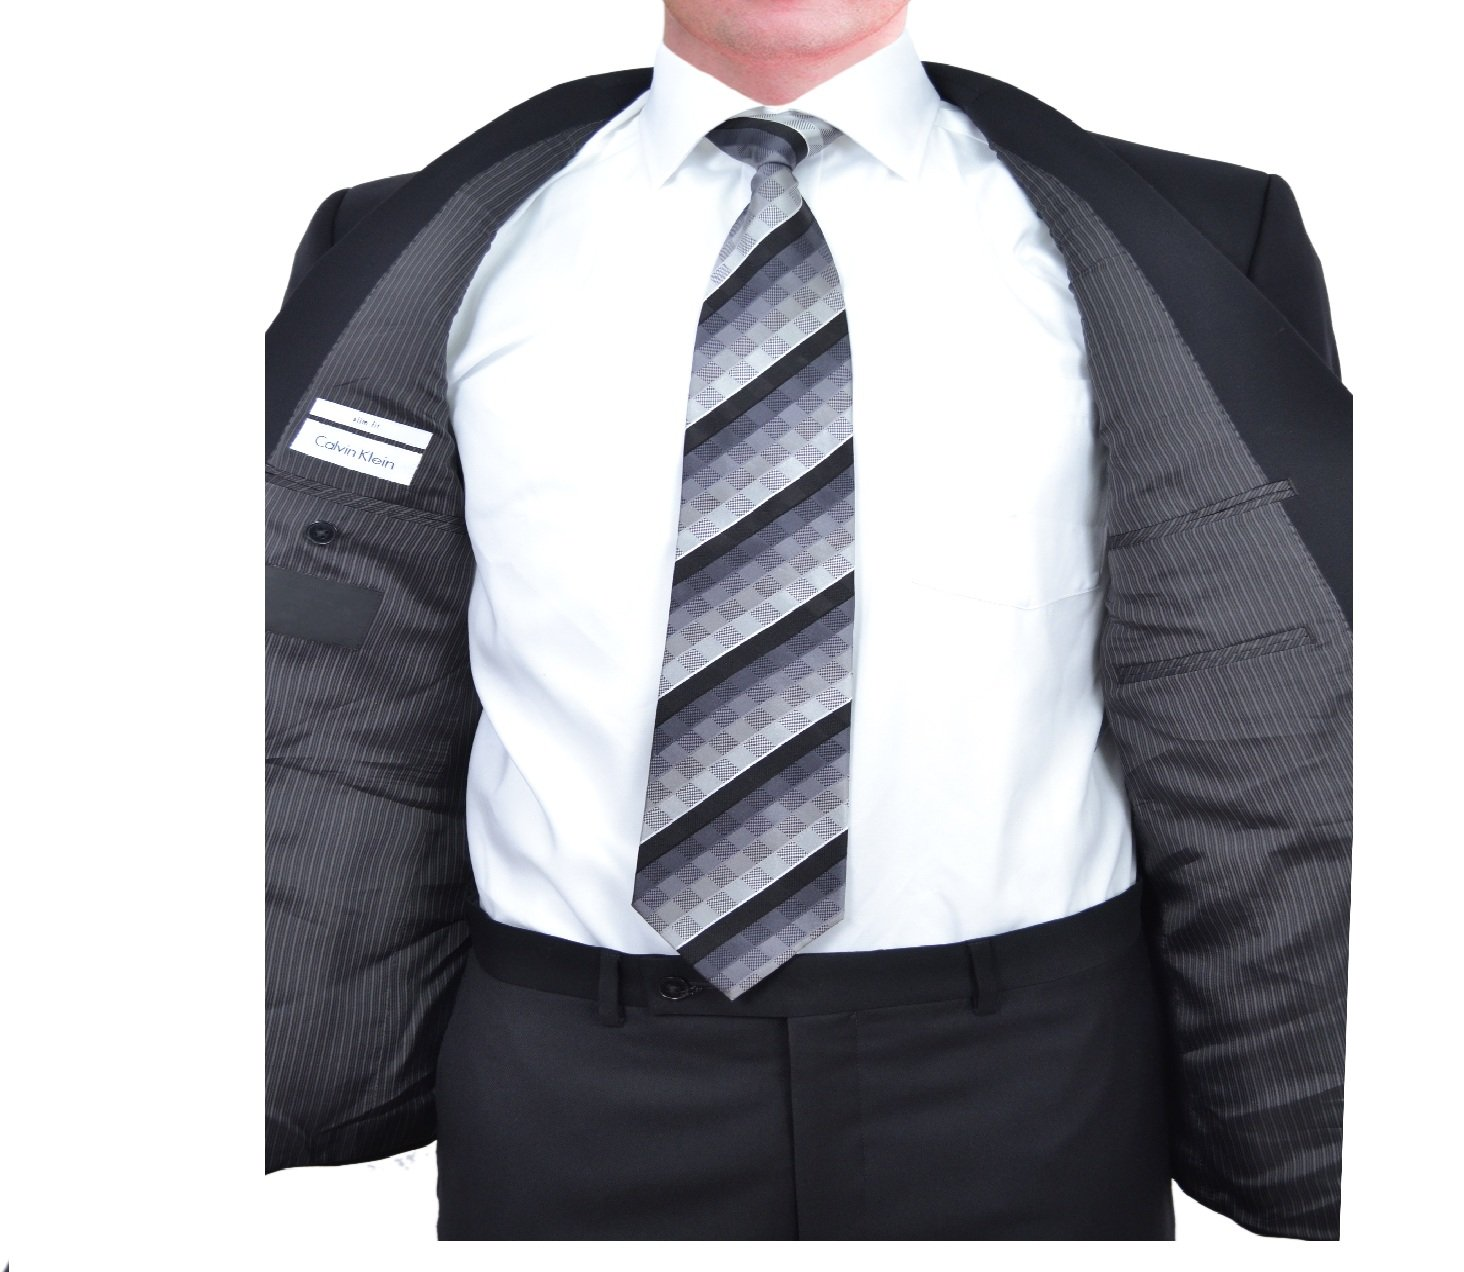 Calvin Klein Slim Fit Black Solid Two Button Wool New Men's Suit Set (44R 40W x 32L) by Calvin ` Klein (Image #2)